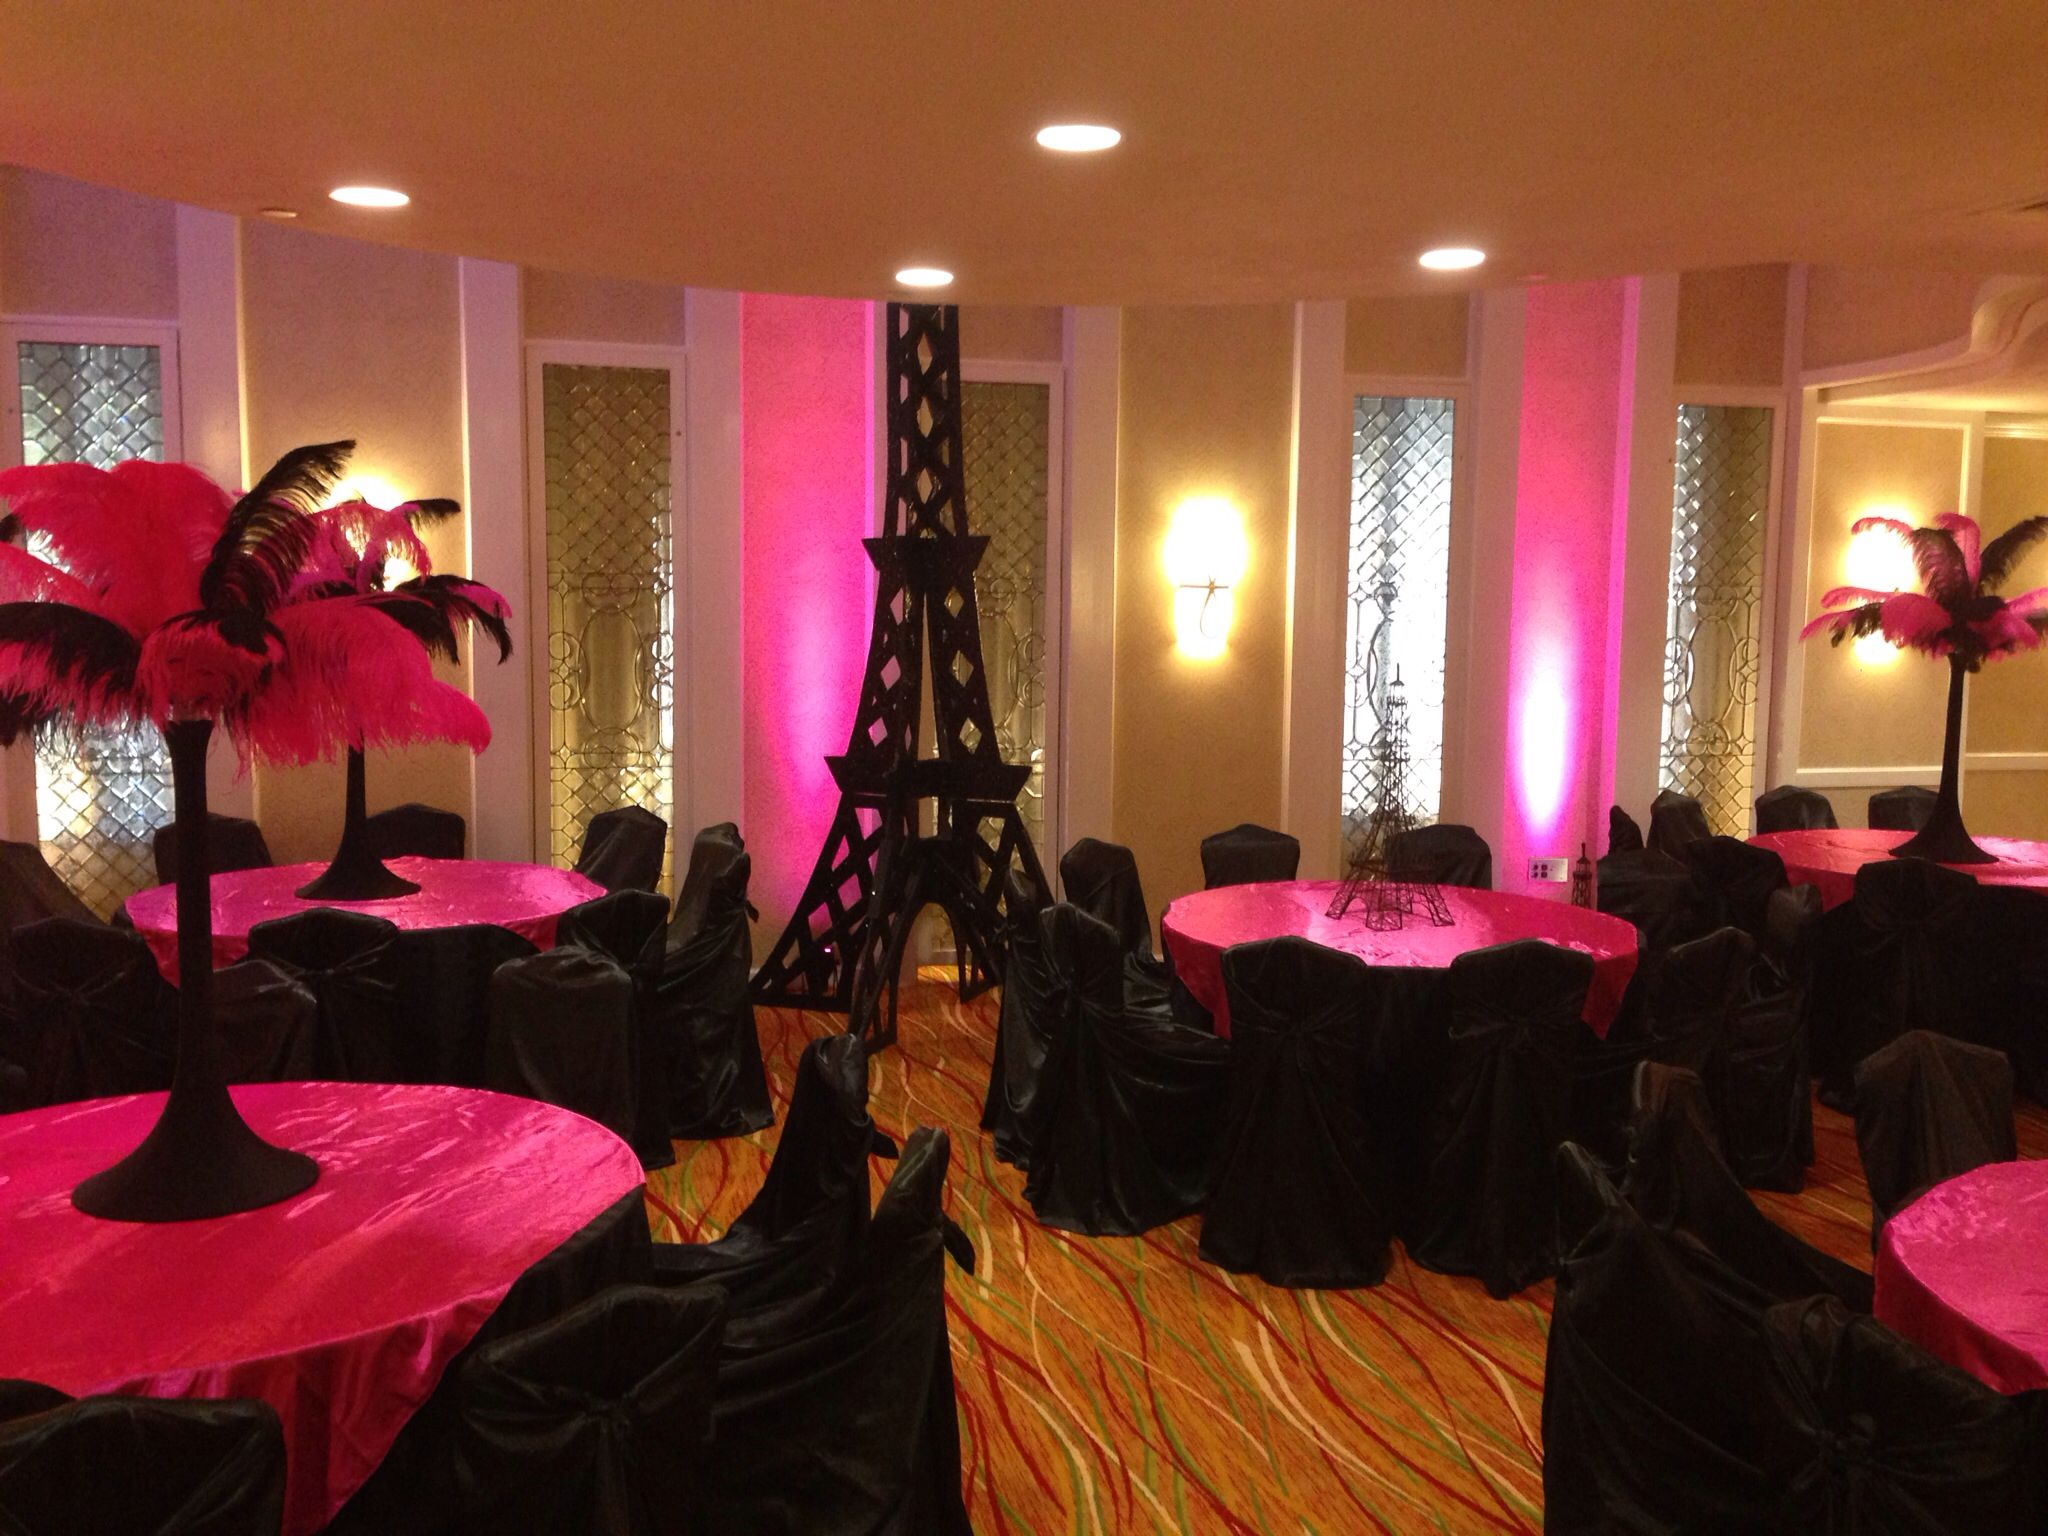 Tem tica de paris para fiesta de 15 fiestas15 fiesta for Decoracion xv anos paris